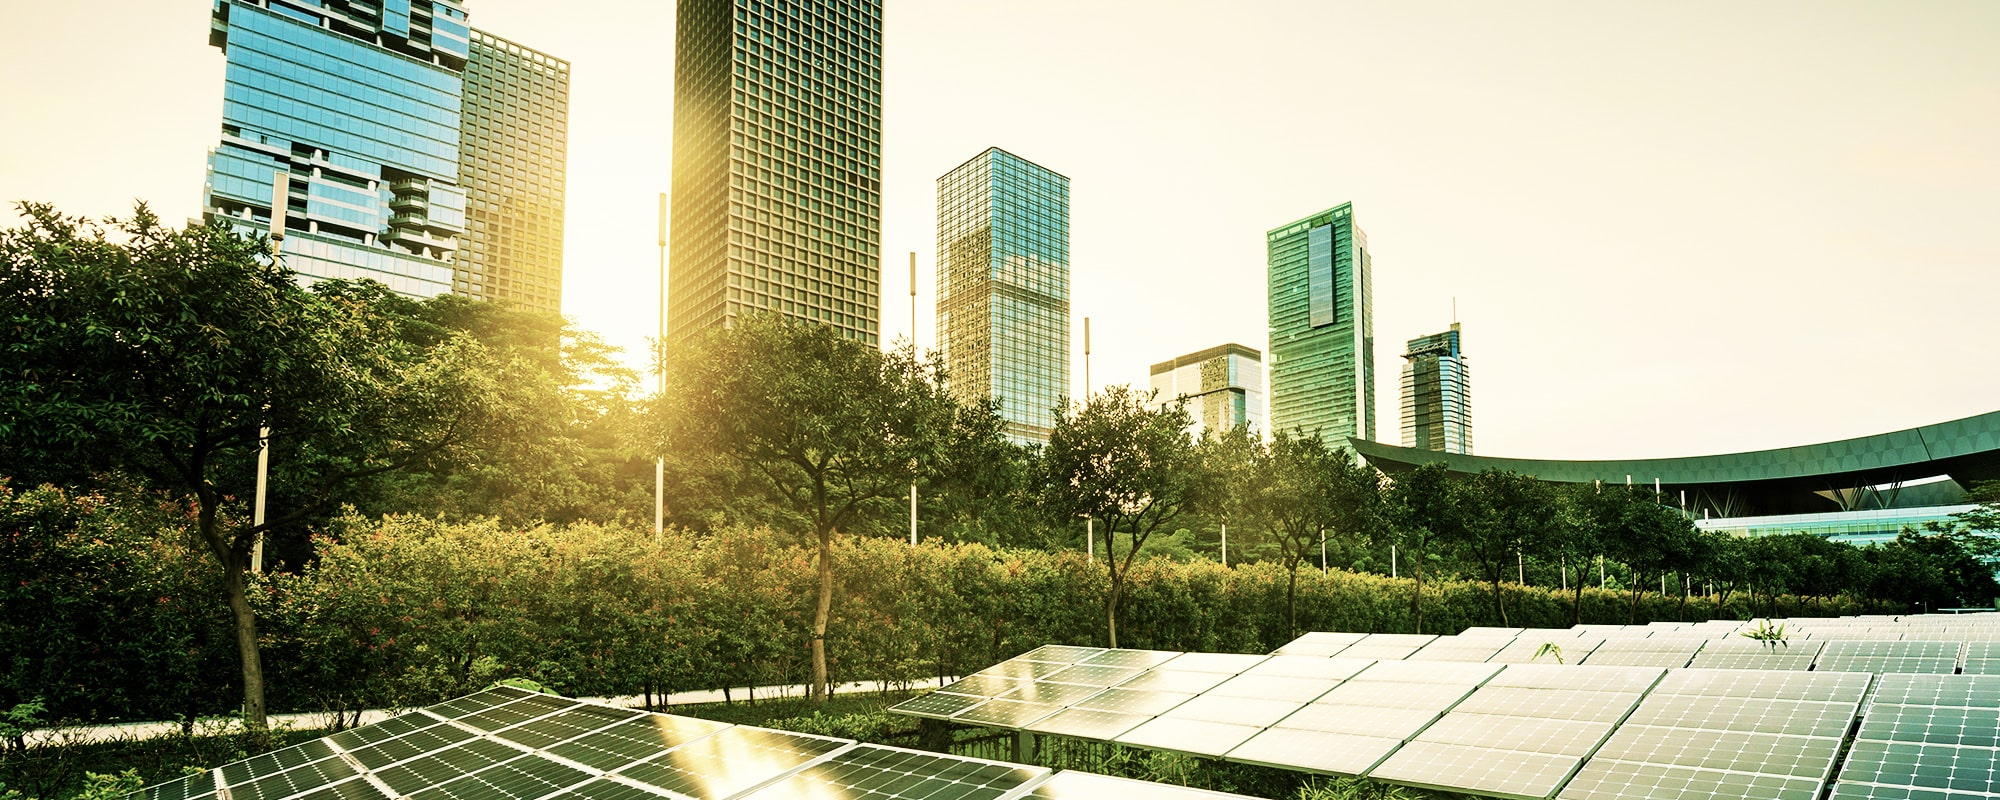 EarthBi sustainable economic model